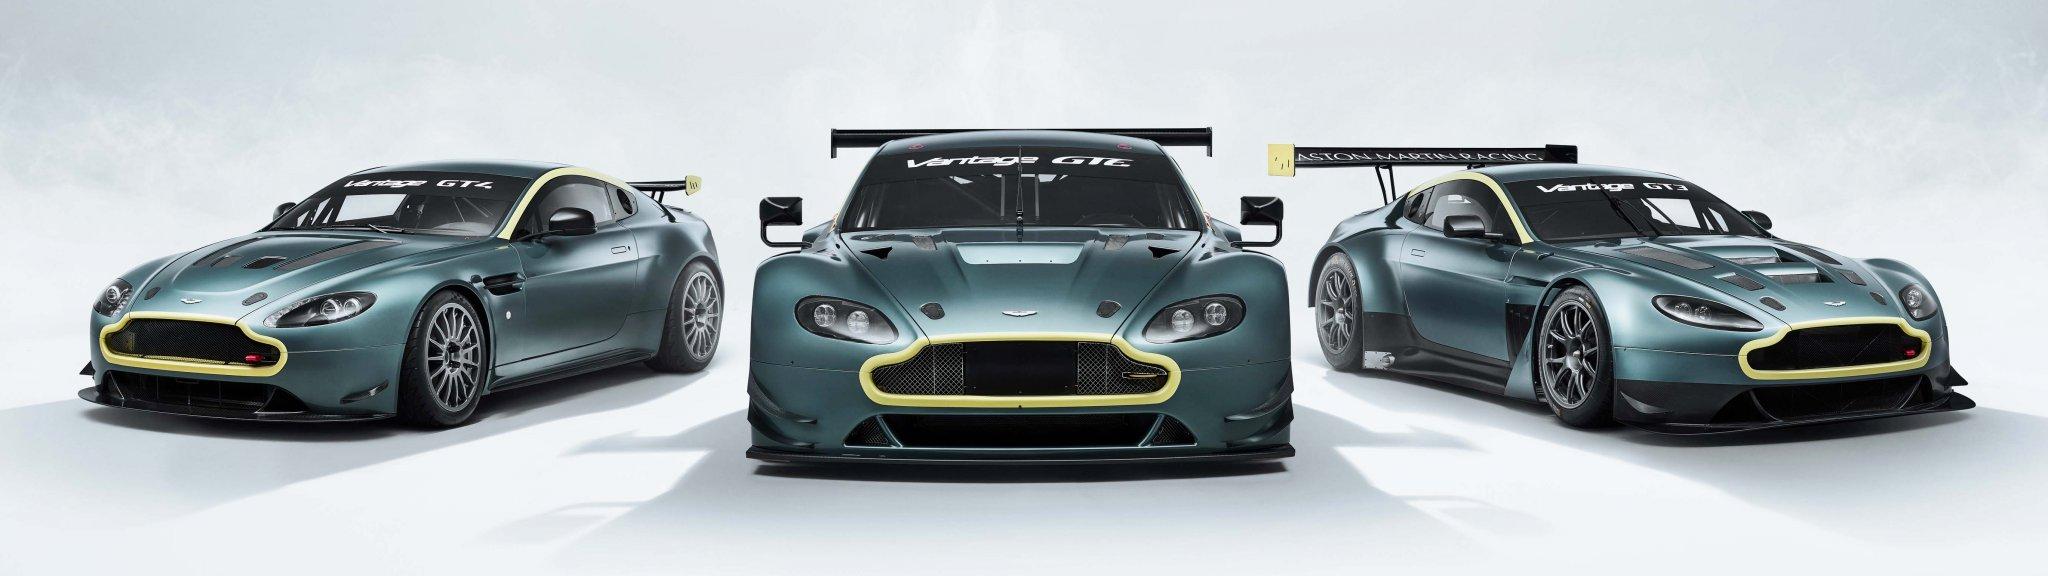 Aston Martin Offers Vantage Legacy Collection Laptrinhx News